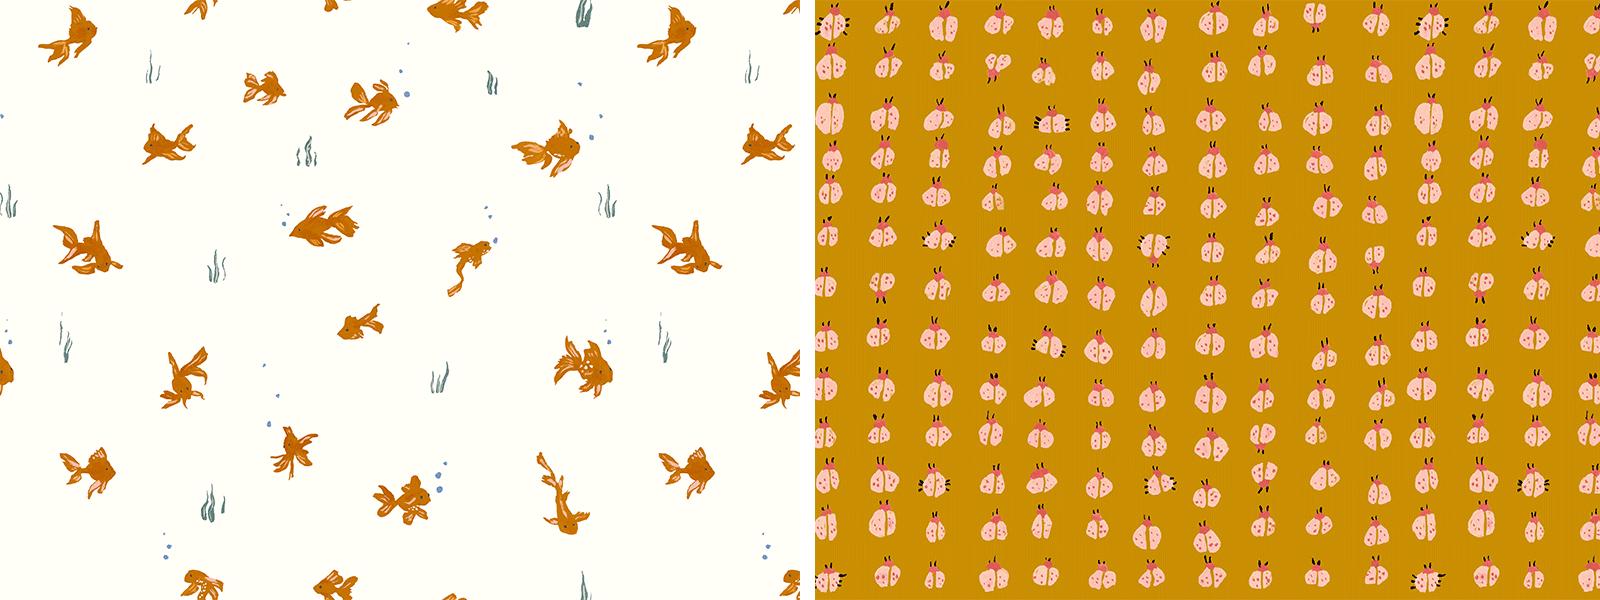 Pattern_11_Margaret-Jeane.png